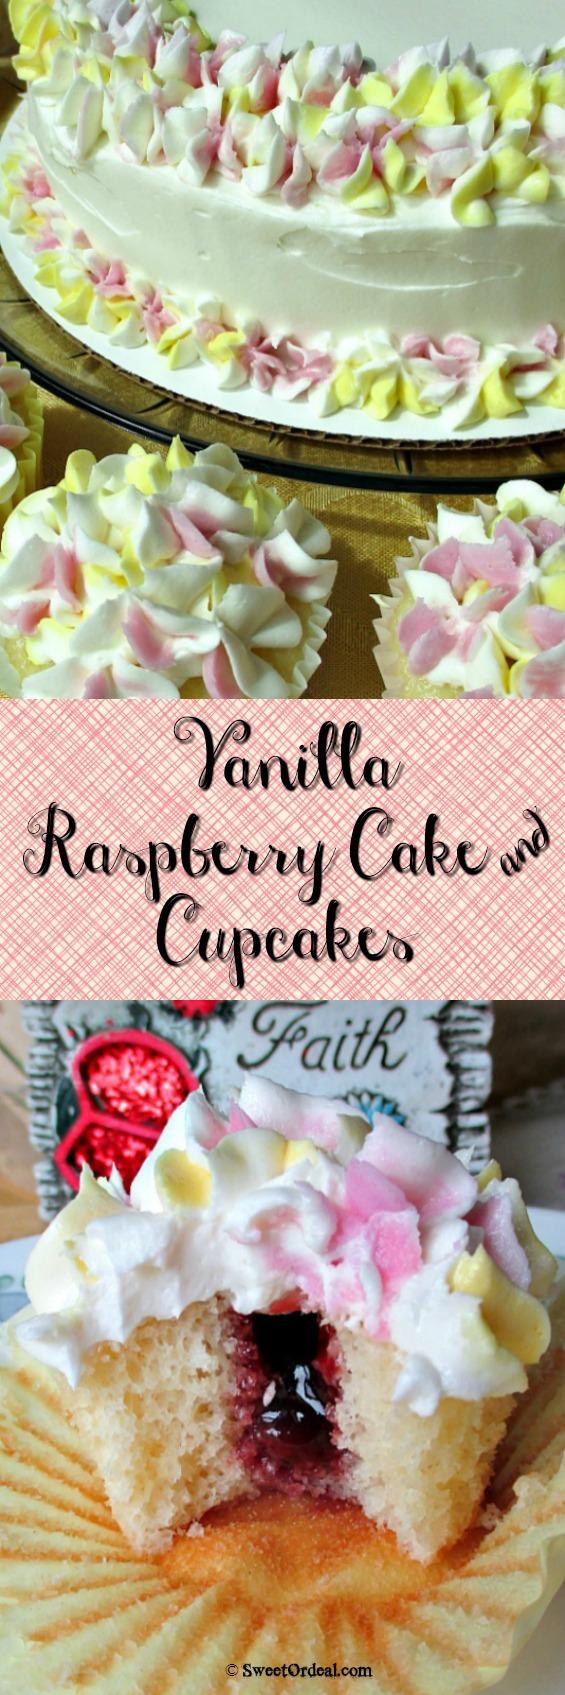 Vanilla Raspberry Cake & Cupcakes